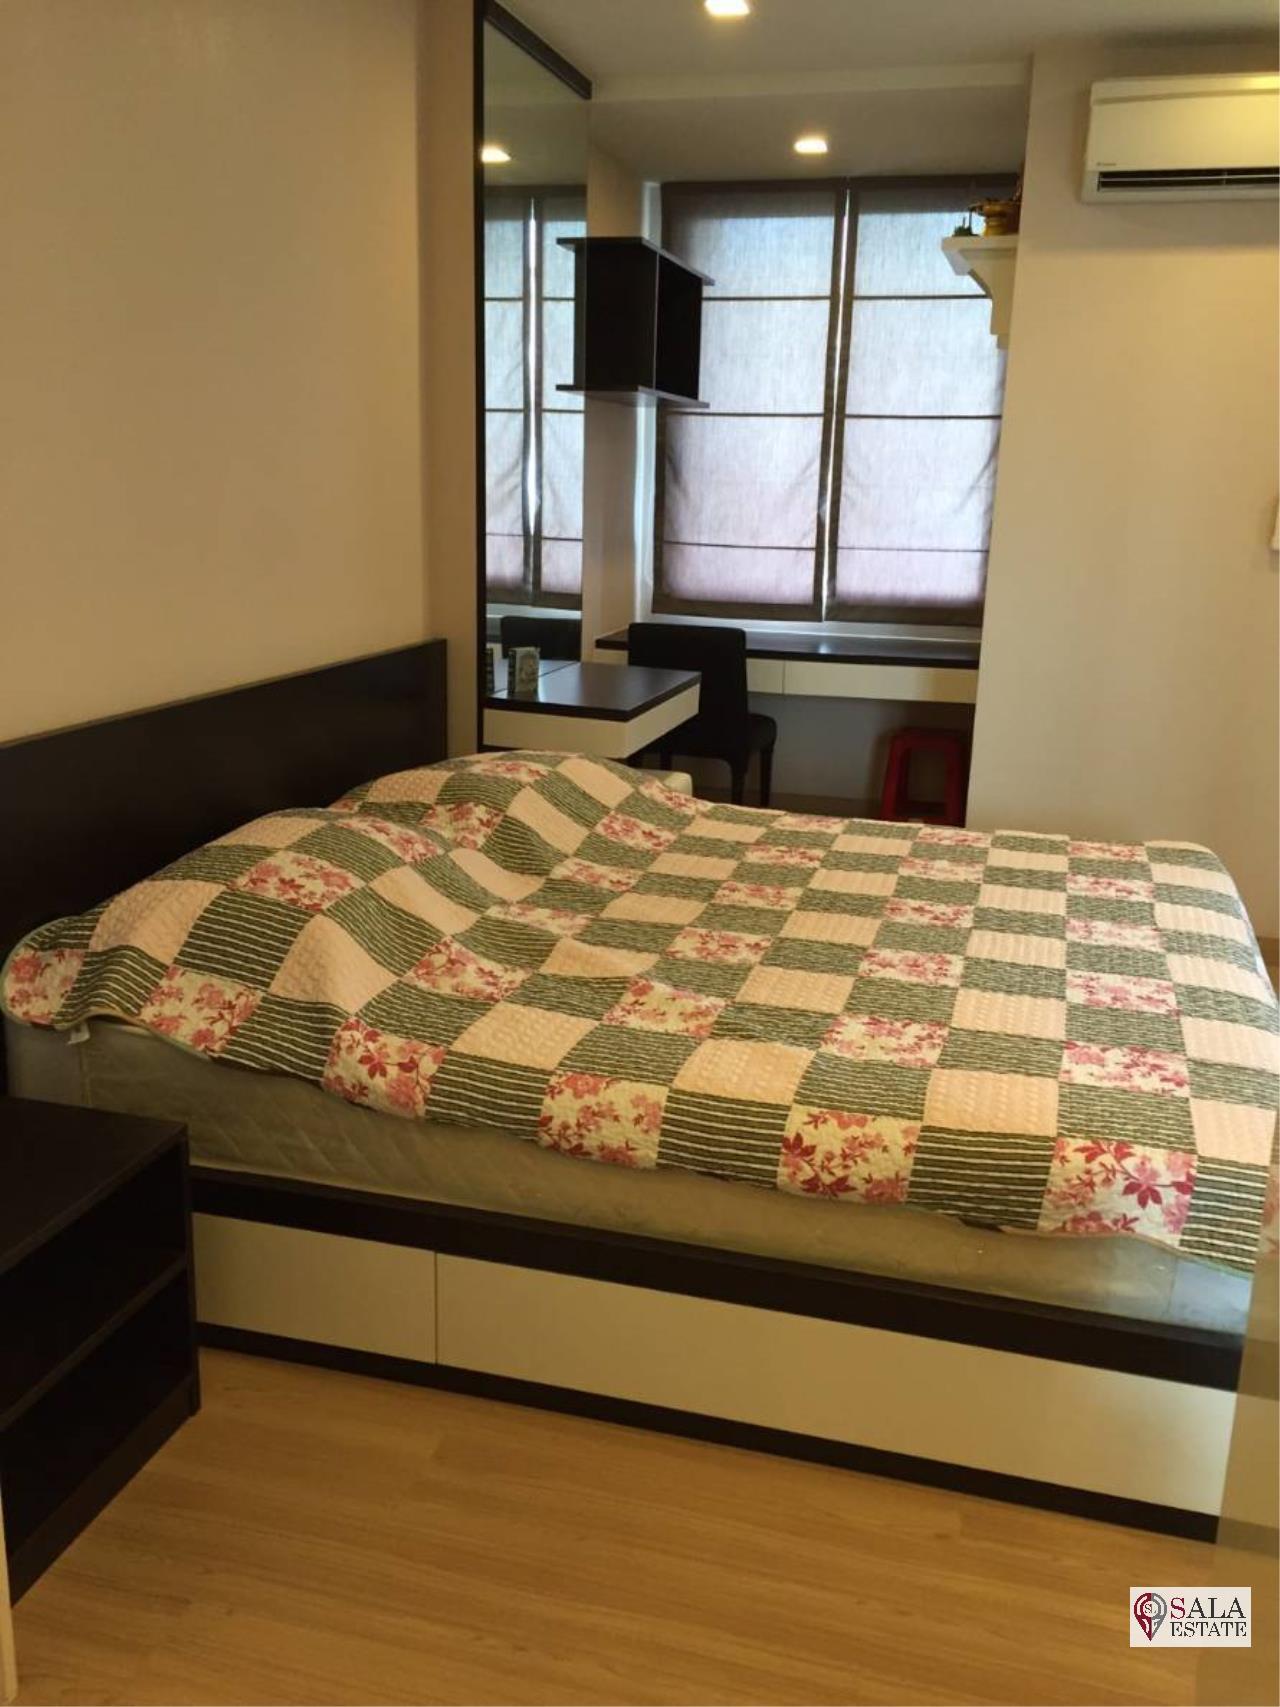 SALA ESTATE Agency's TREE CONDO EKAMAI – BTS EKKAMAI, 1 BEDROOMS 2BATHROOMS, FULLY FURNISHED FOR RENT 4